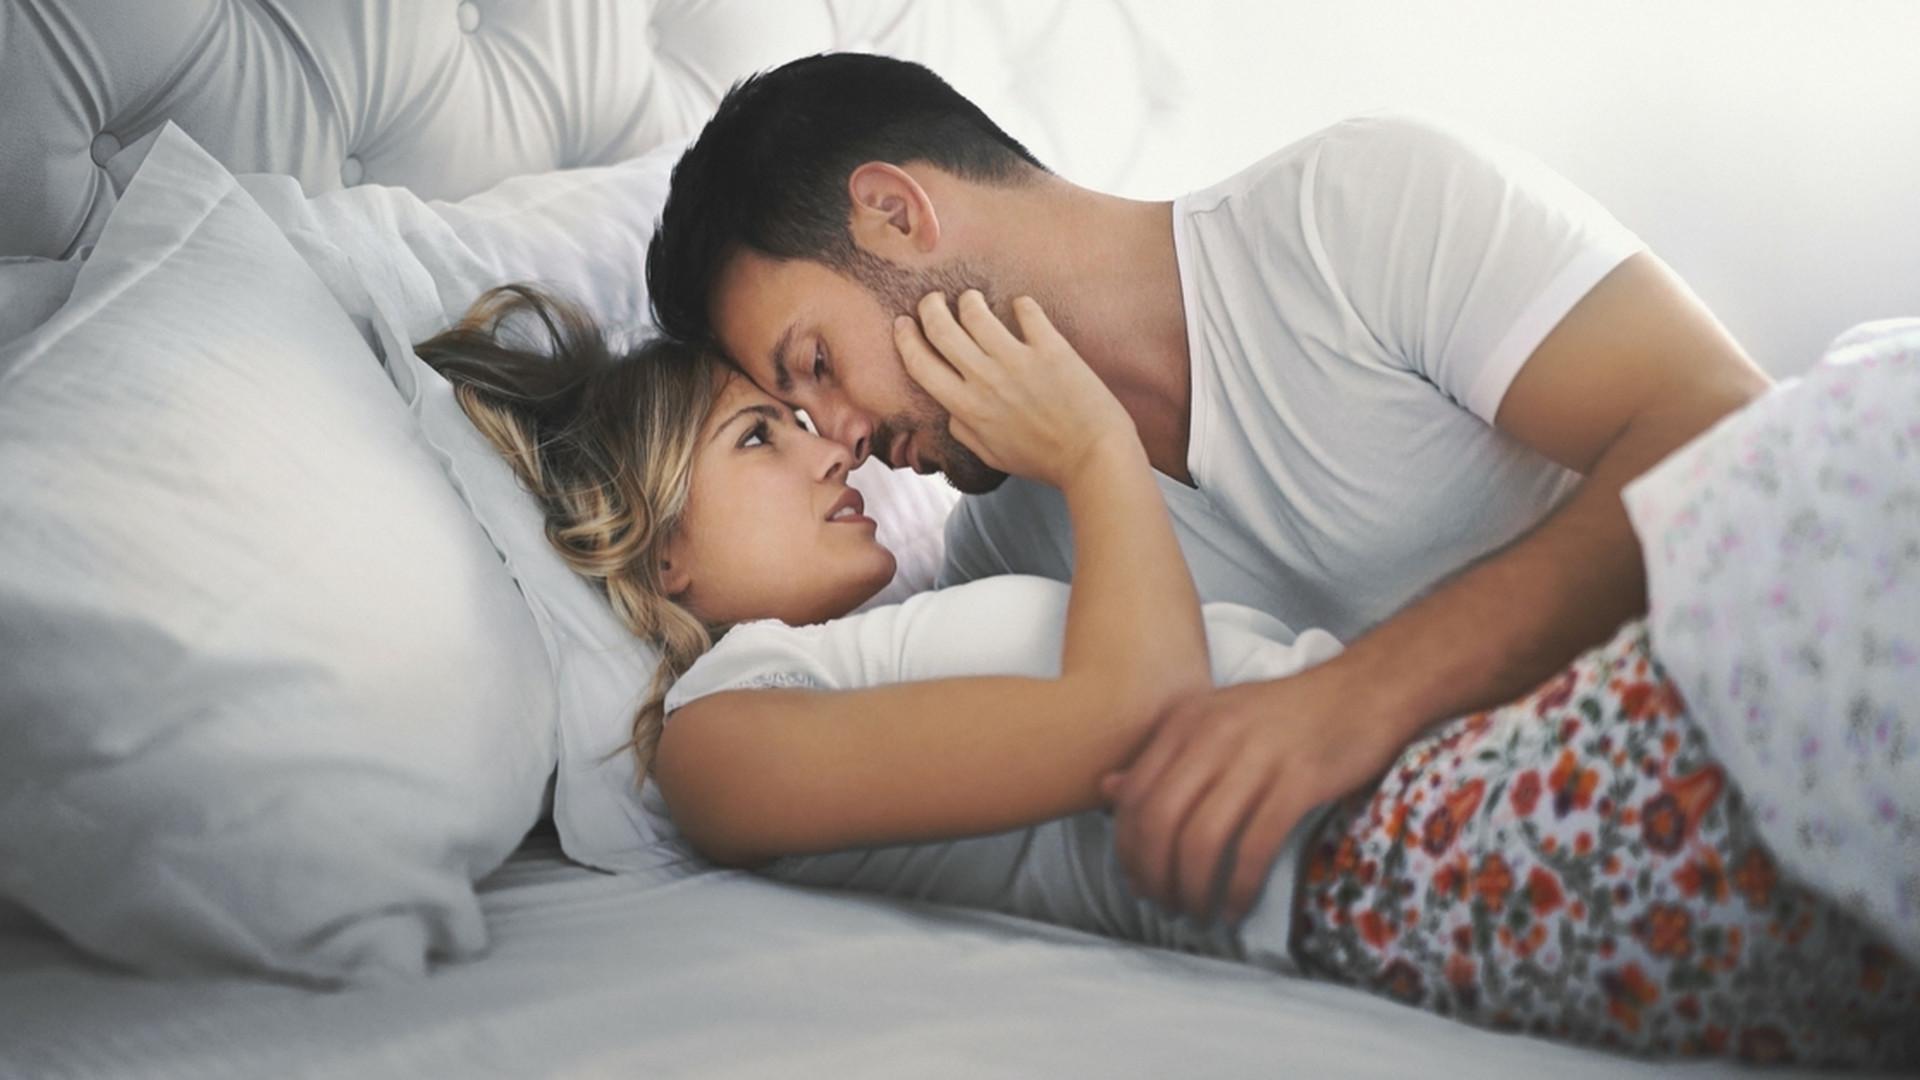 lepie sexulne techniky